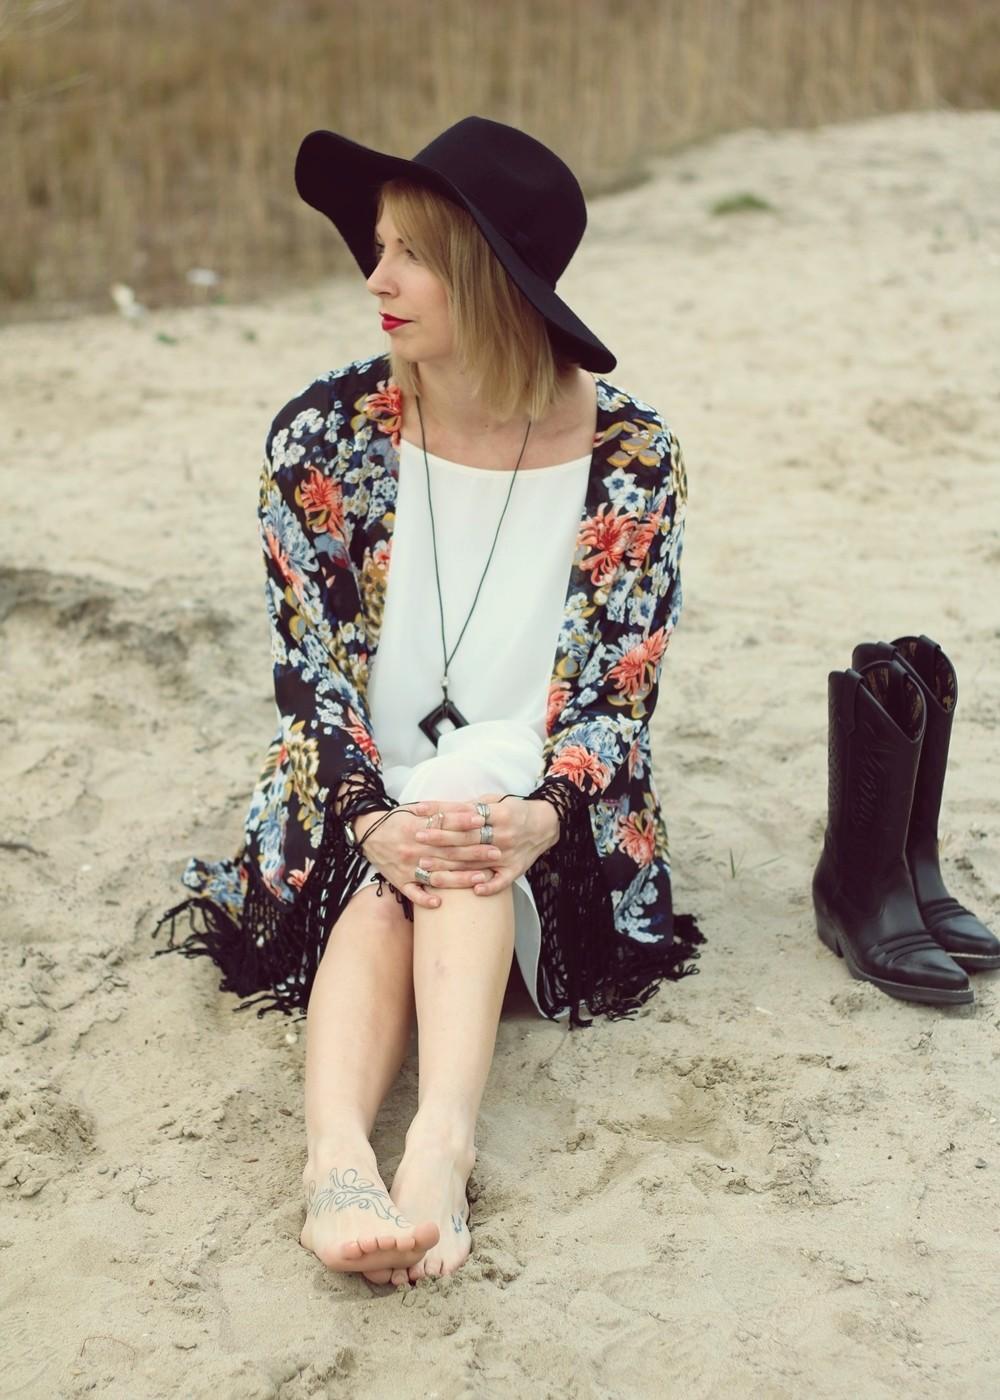 Fashionblogger Outfit Kimono weisses Kleid Cowboystiefel Schlapphut (13)